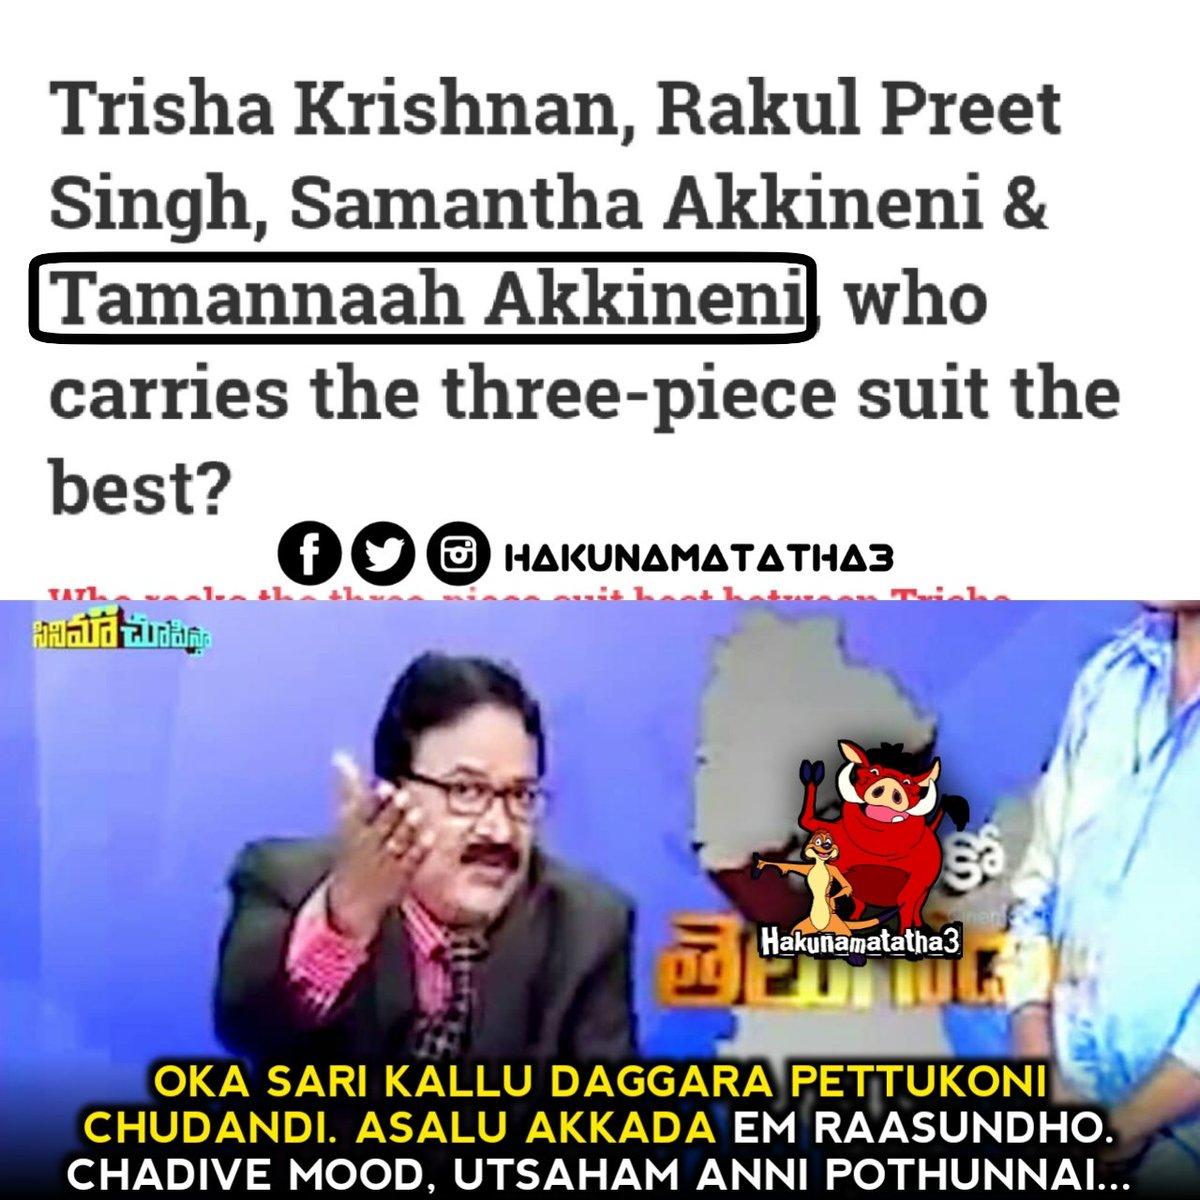 Asalu News Chadavali anna Intrest Motham pothunddi.. #Hakunamatatha3 #TamannaahBhatia pic.twitter.com/TcWMMaJJAu